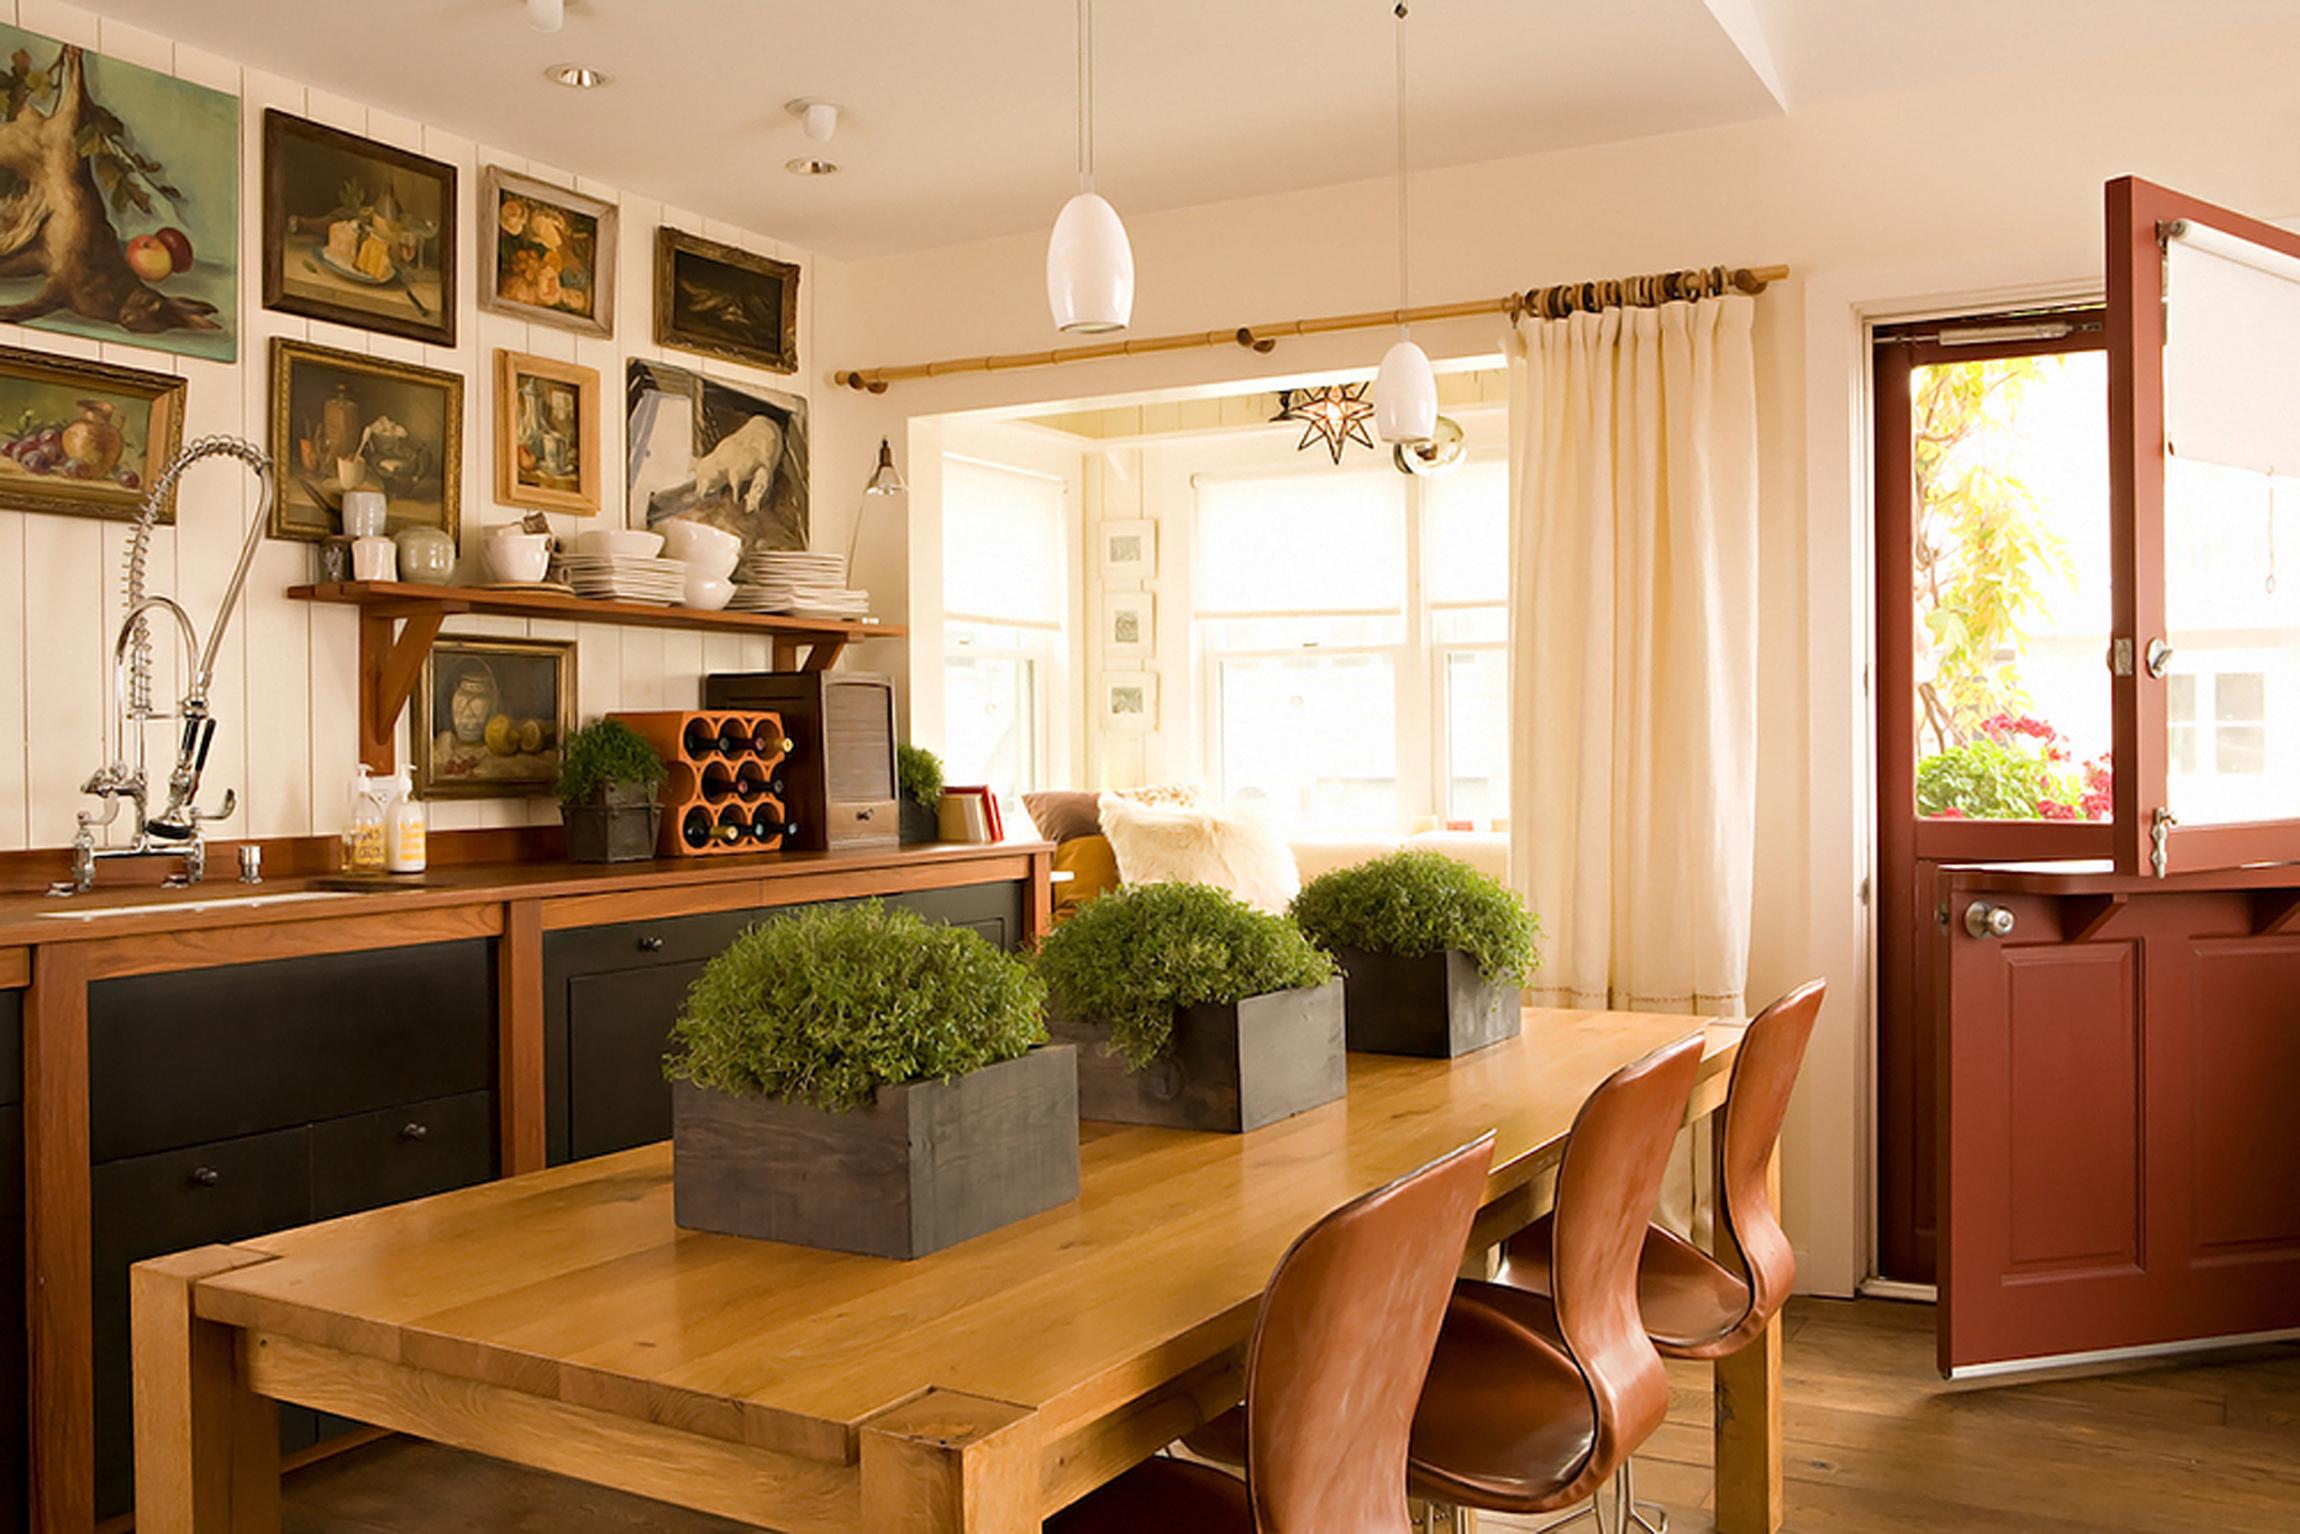 Kitchen Design In Warm Shades With Impressive Decoration (View 31 of 31)